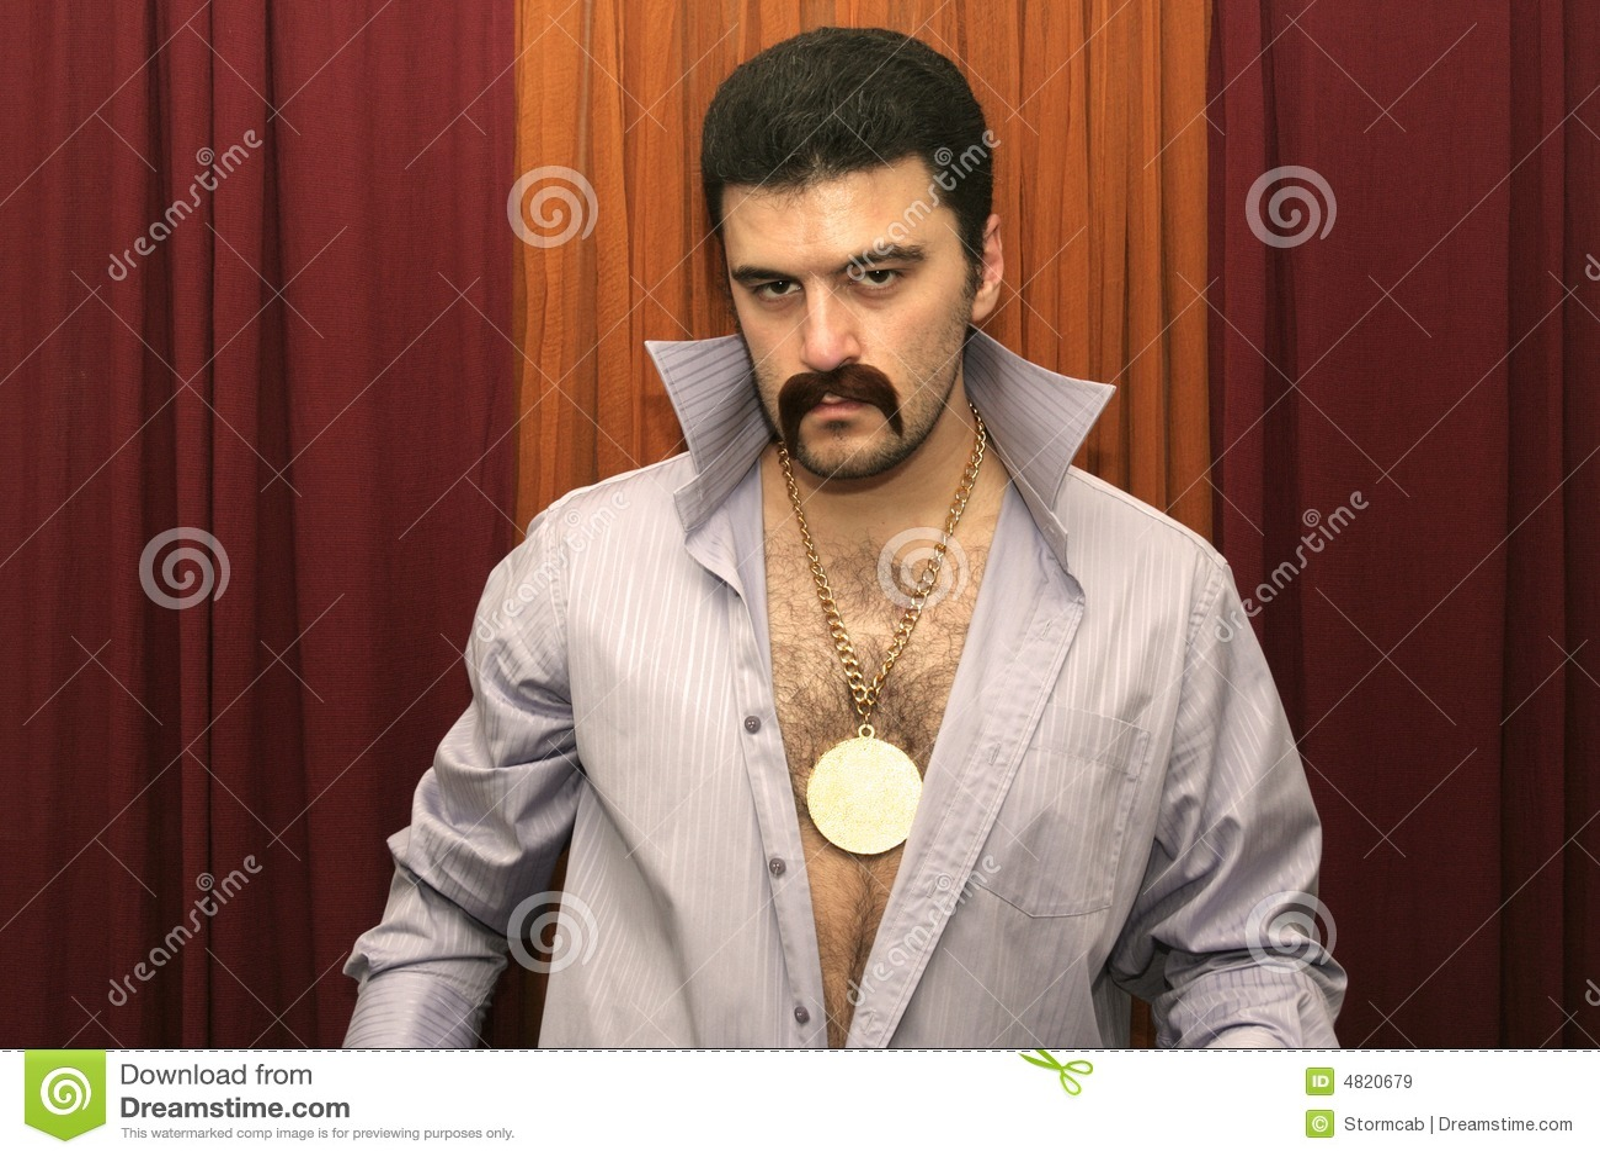 Disco Man Royalty Free Stock Images - Image: 4820679